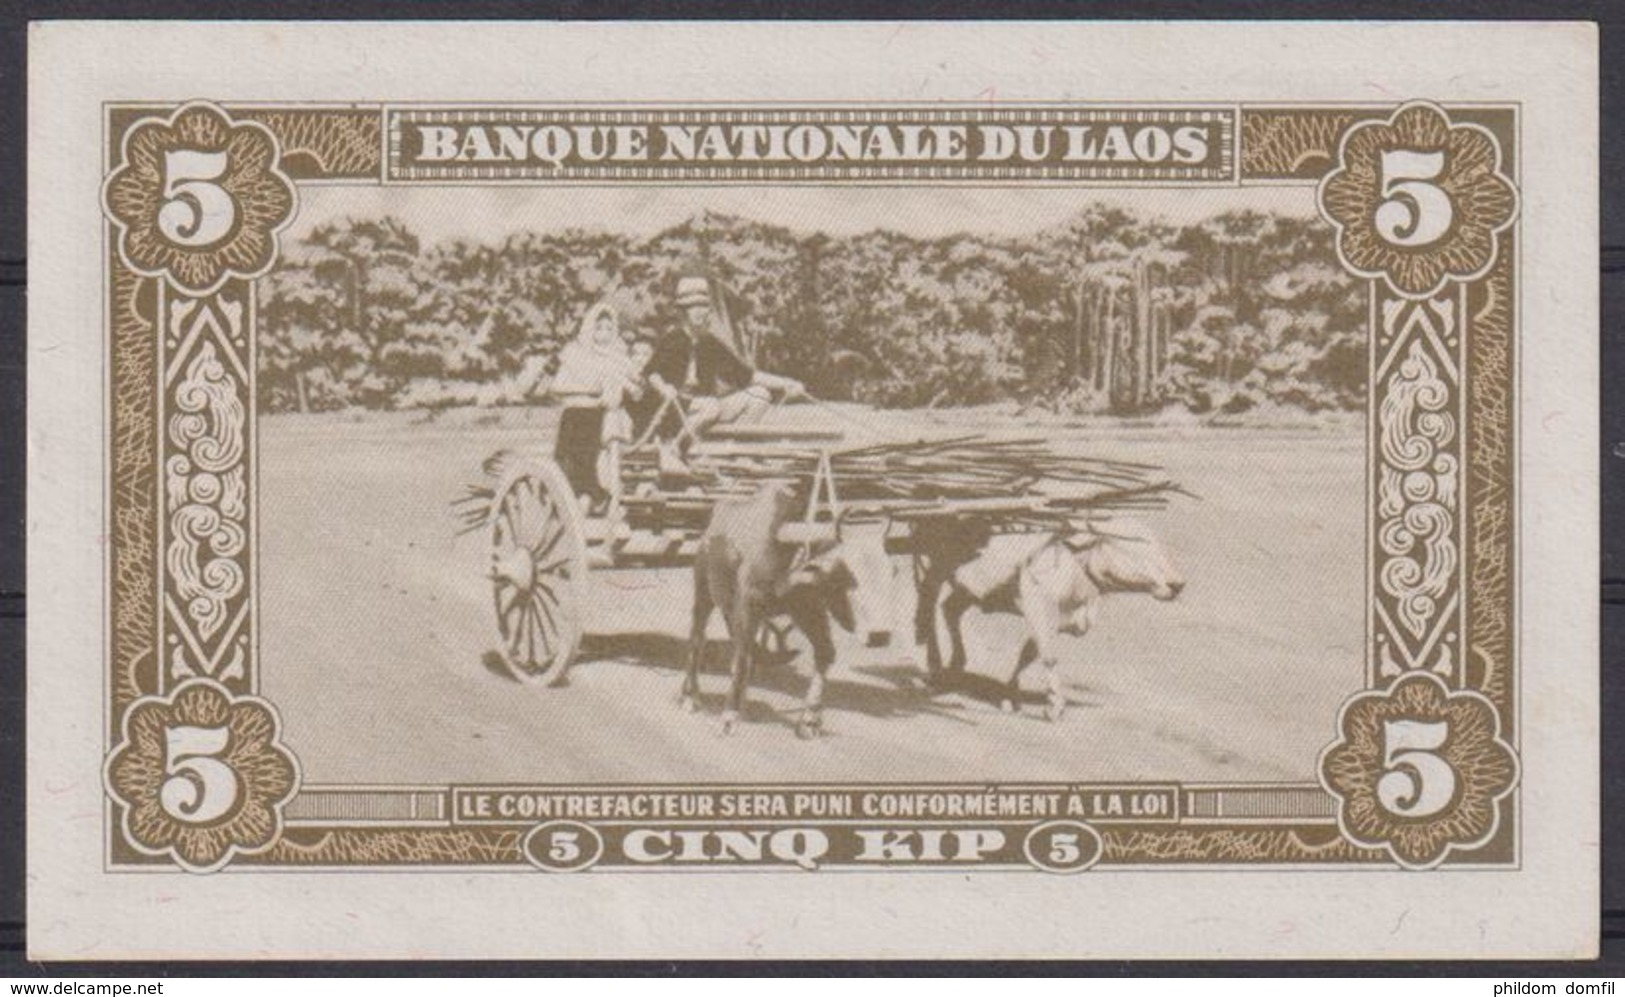 Ref. 2305-2728 - BIN LAOS . 1957. LAOS 5 KIP 1957 UN - Laos